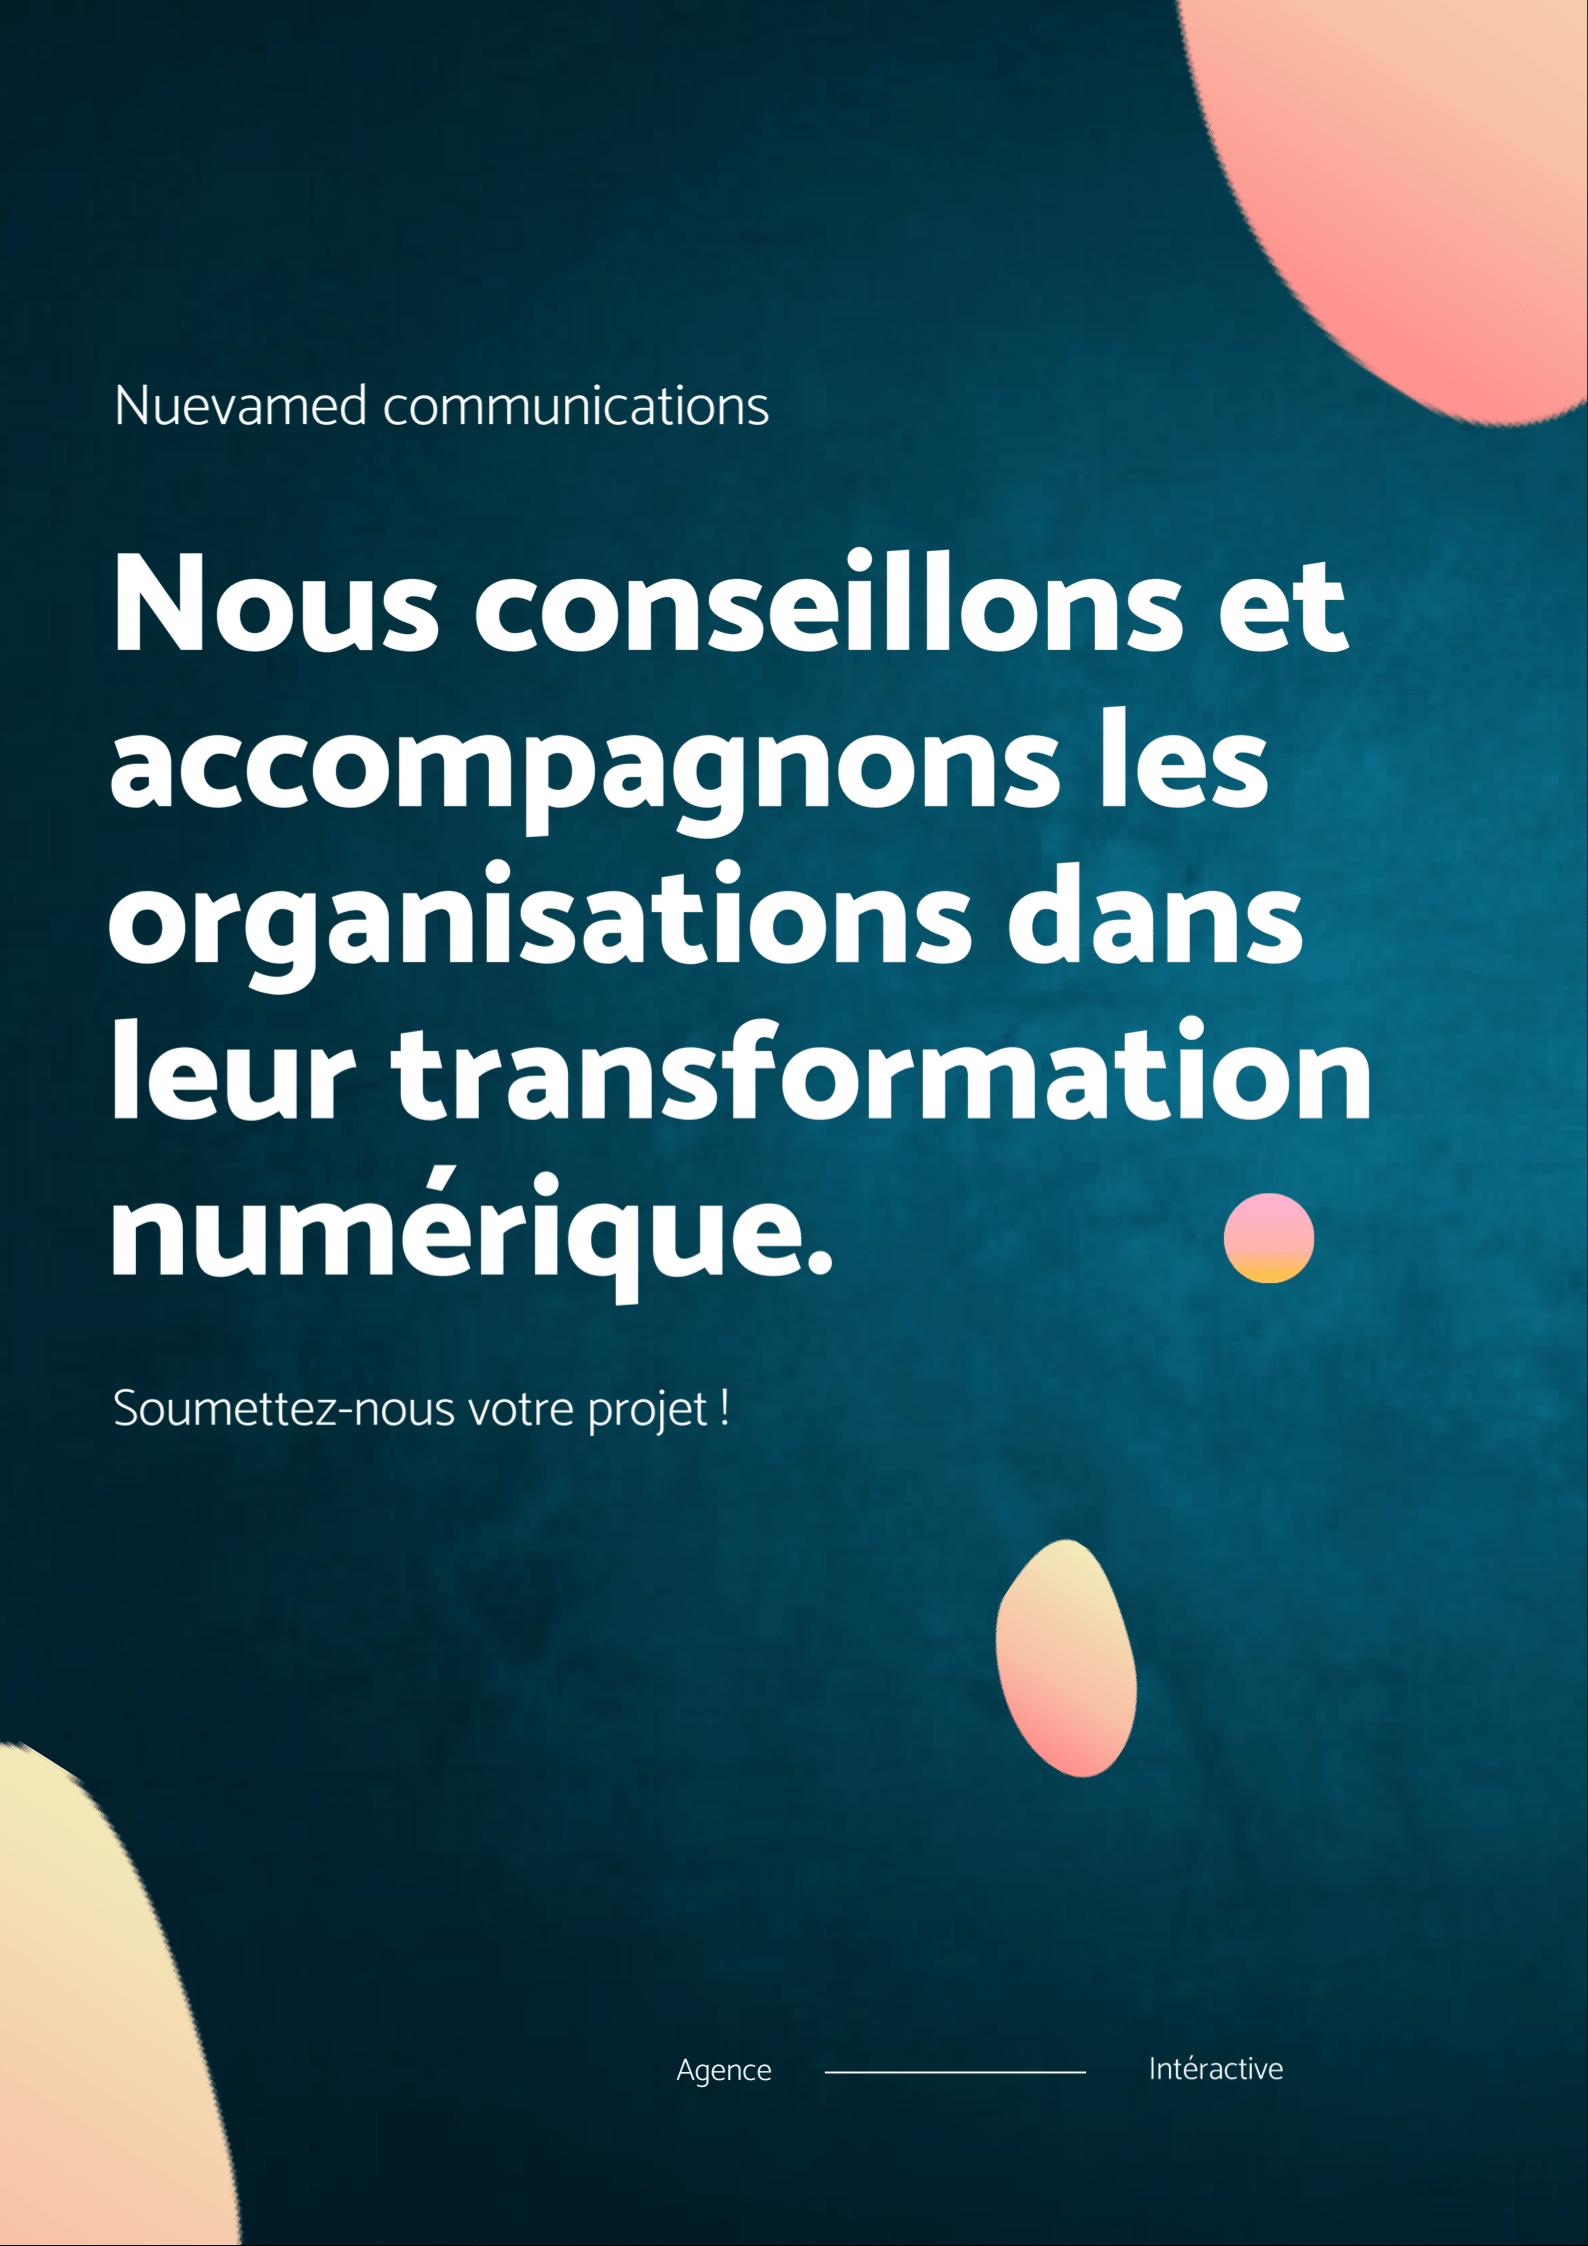 Agence-numérique-digitale-montreal-nuevamed